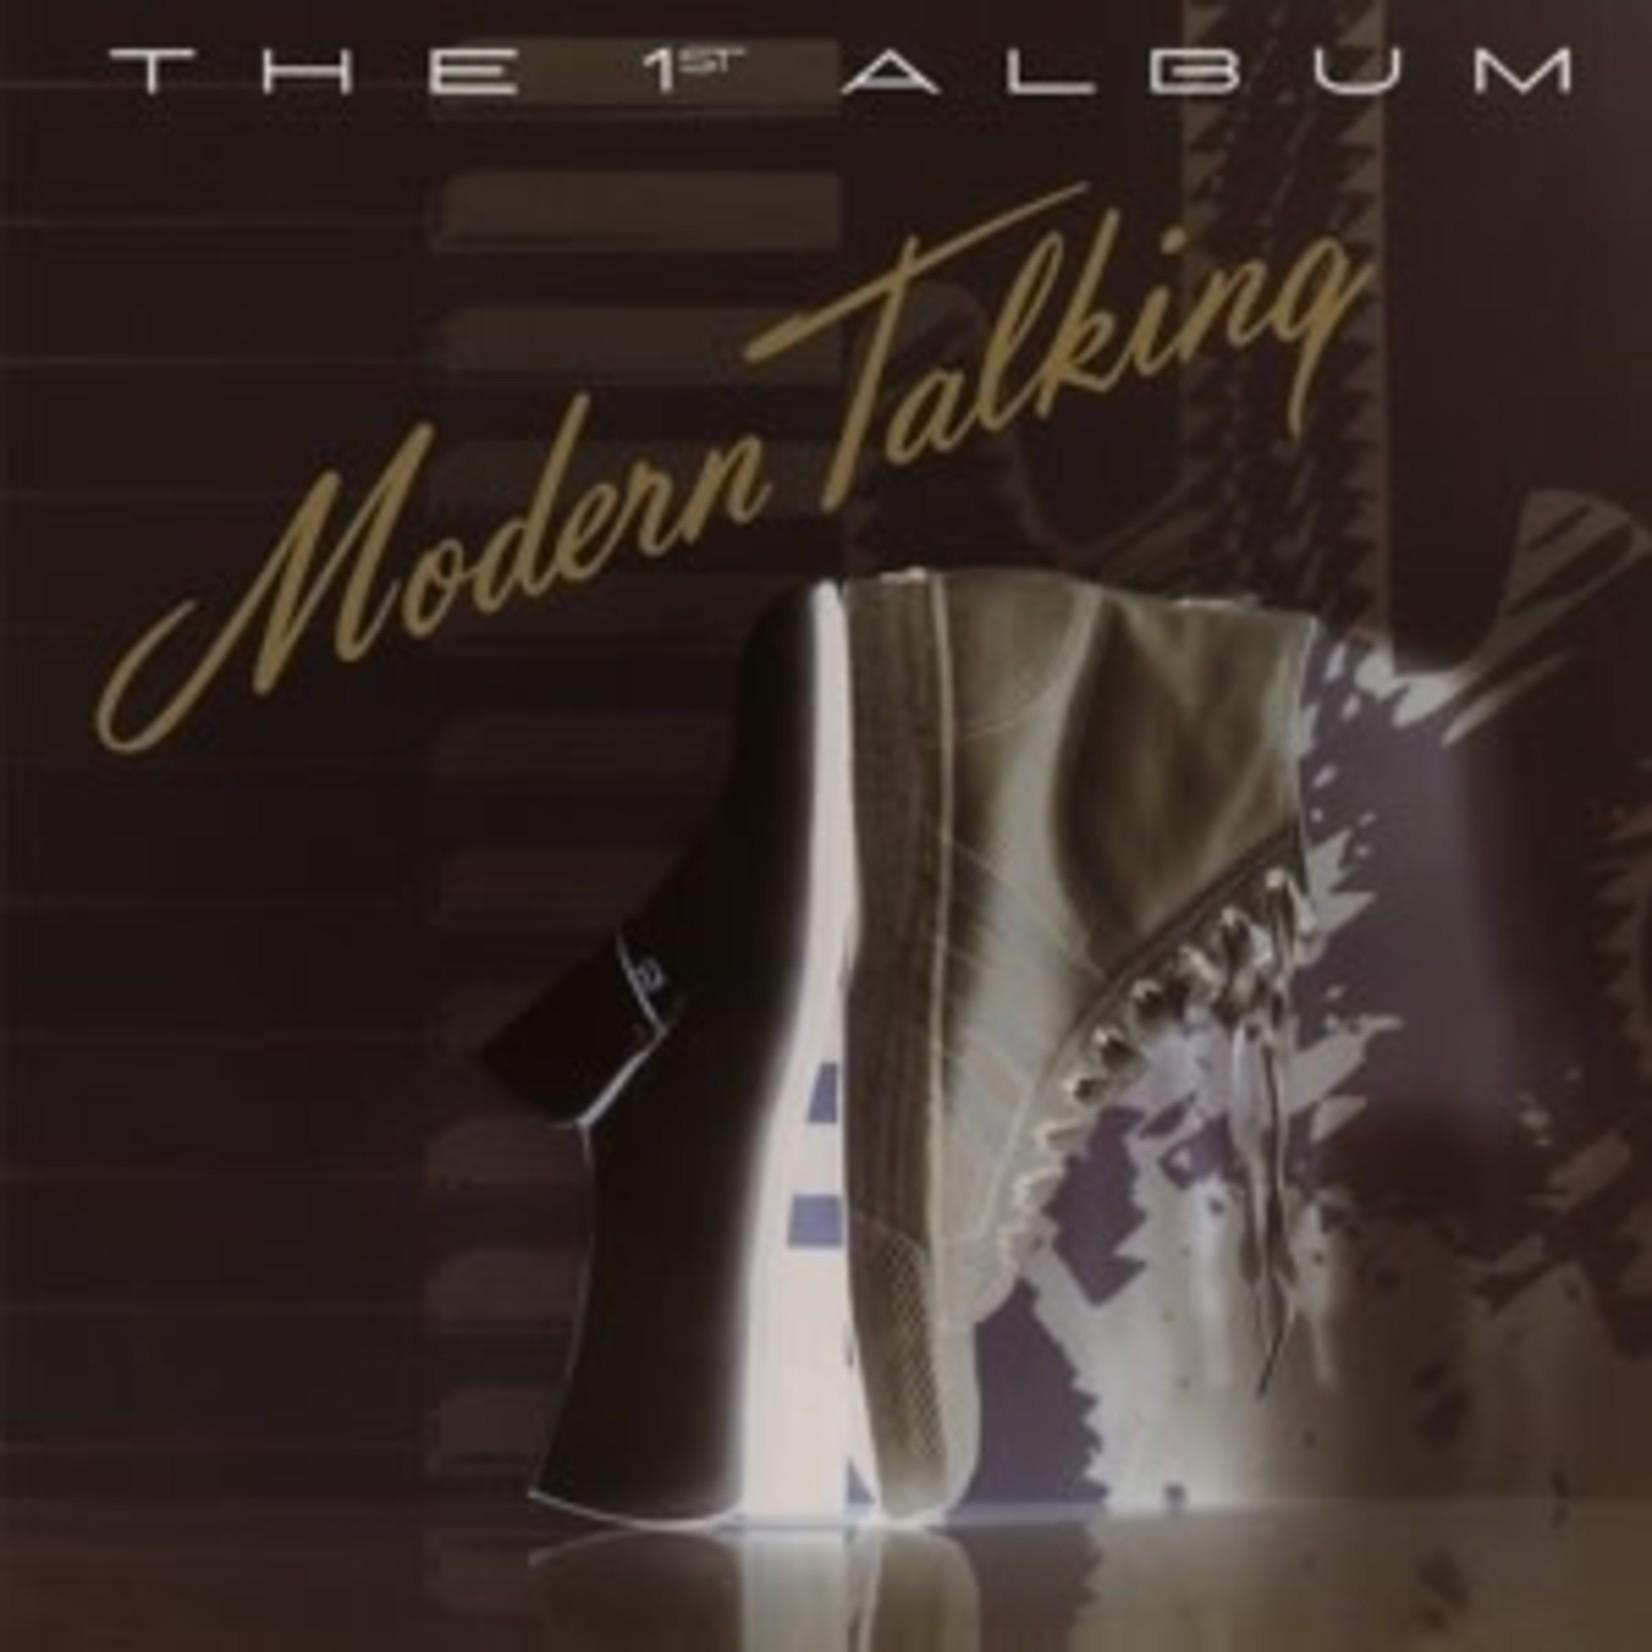 MODERN TALKING  - First Album  Coloured Vinyl_ High Quality_ Insert_ Anniversary Edition   (VINYL)